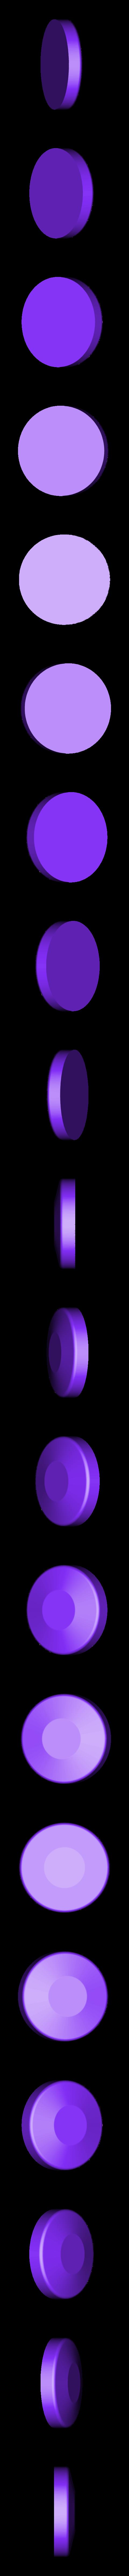 Front_Engine_-_Part_3a-.STL Download free STL file 4-8-8-4 Big Boy Locomotive • 3D printer object, RaymondDeLuca